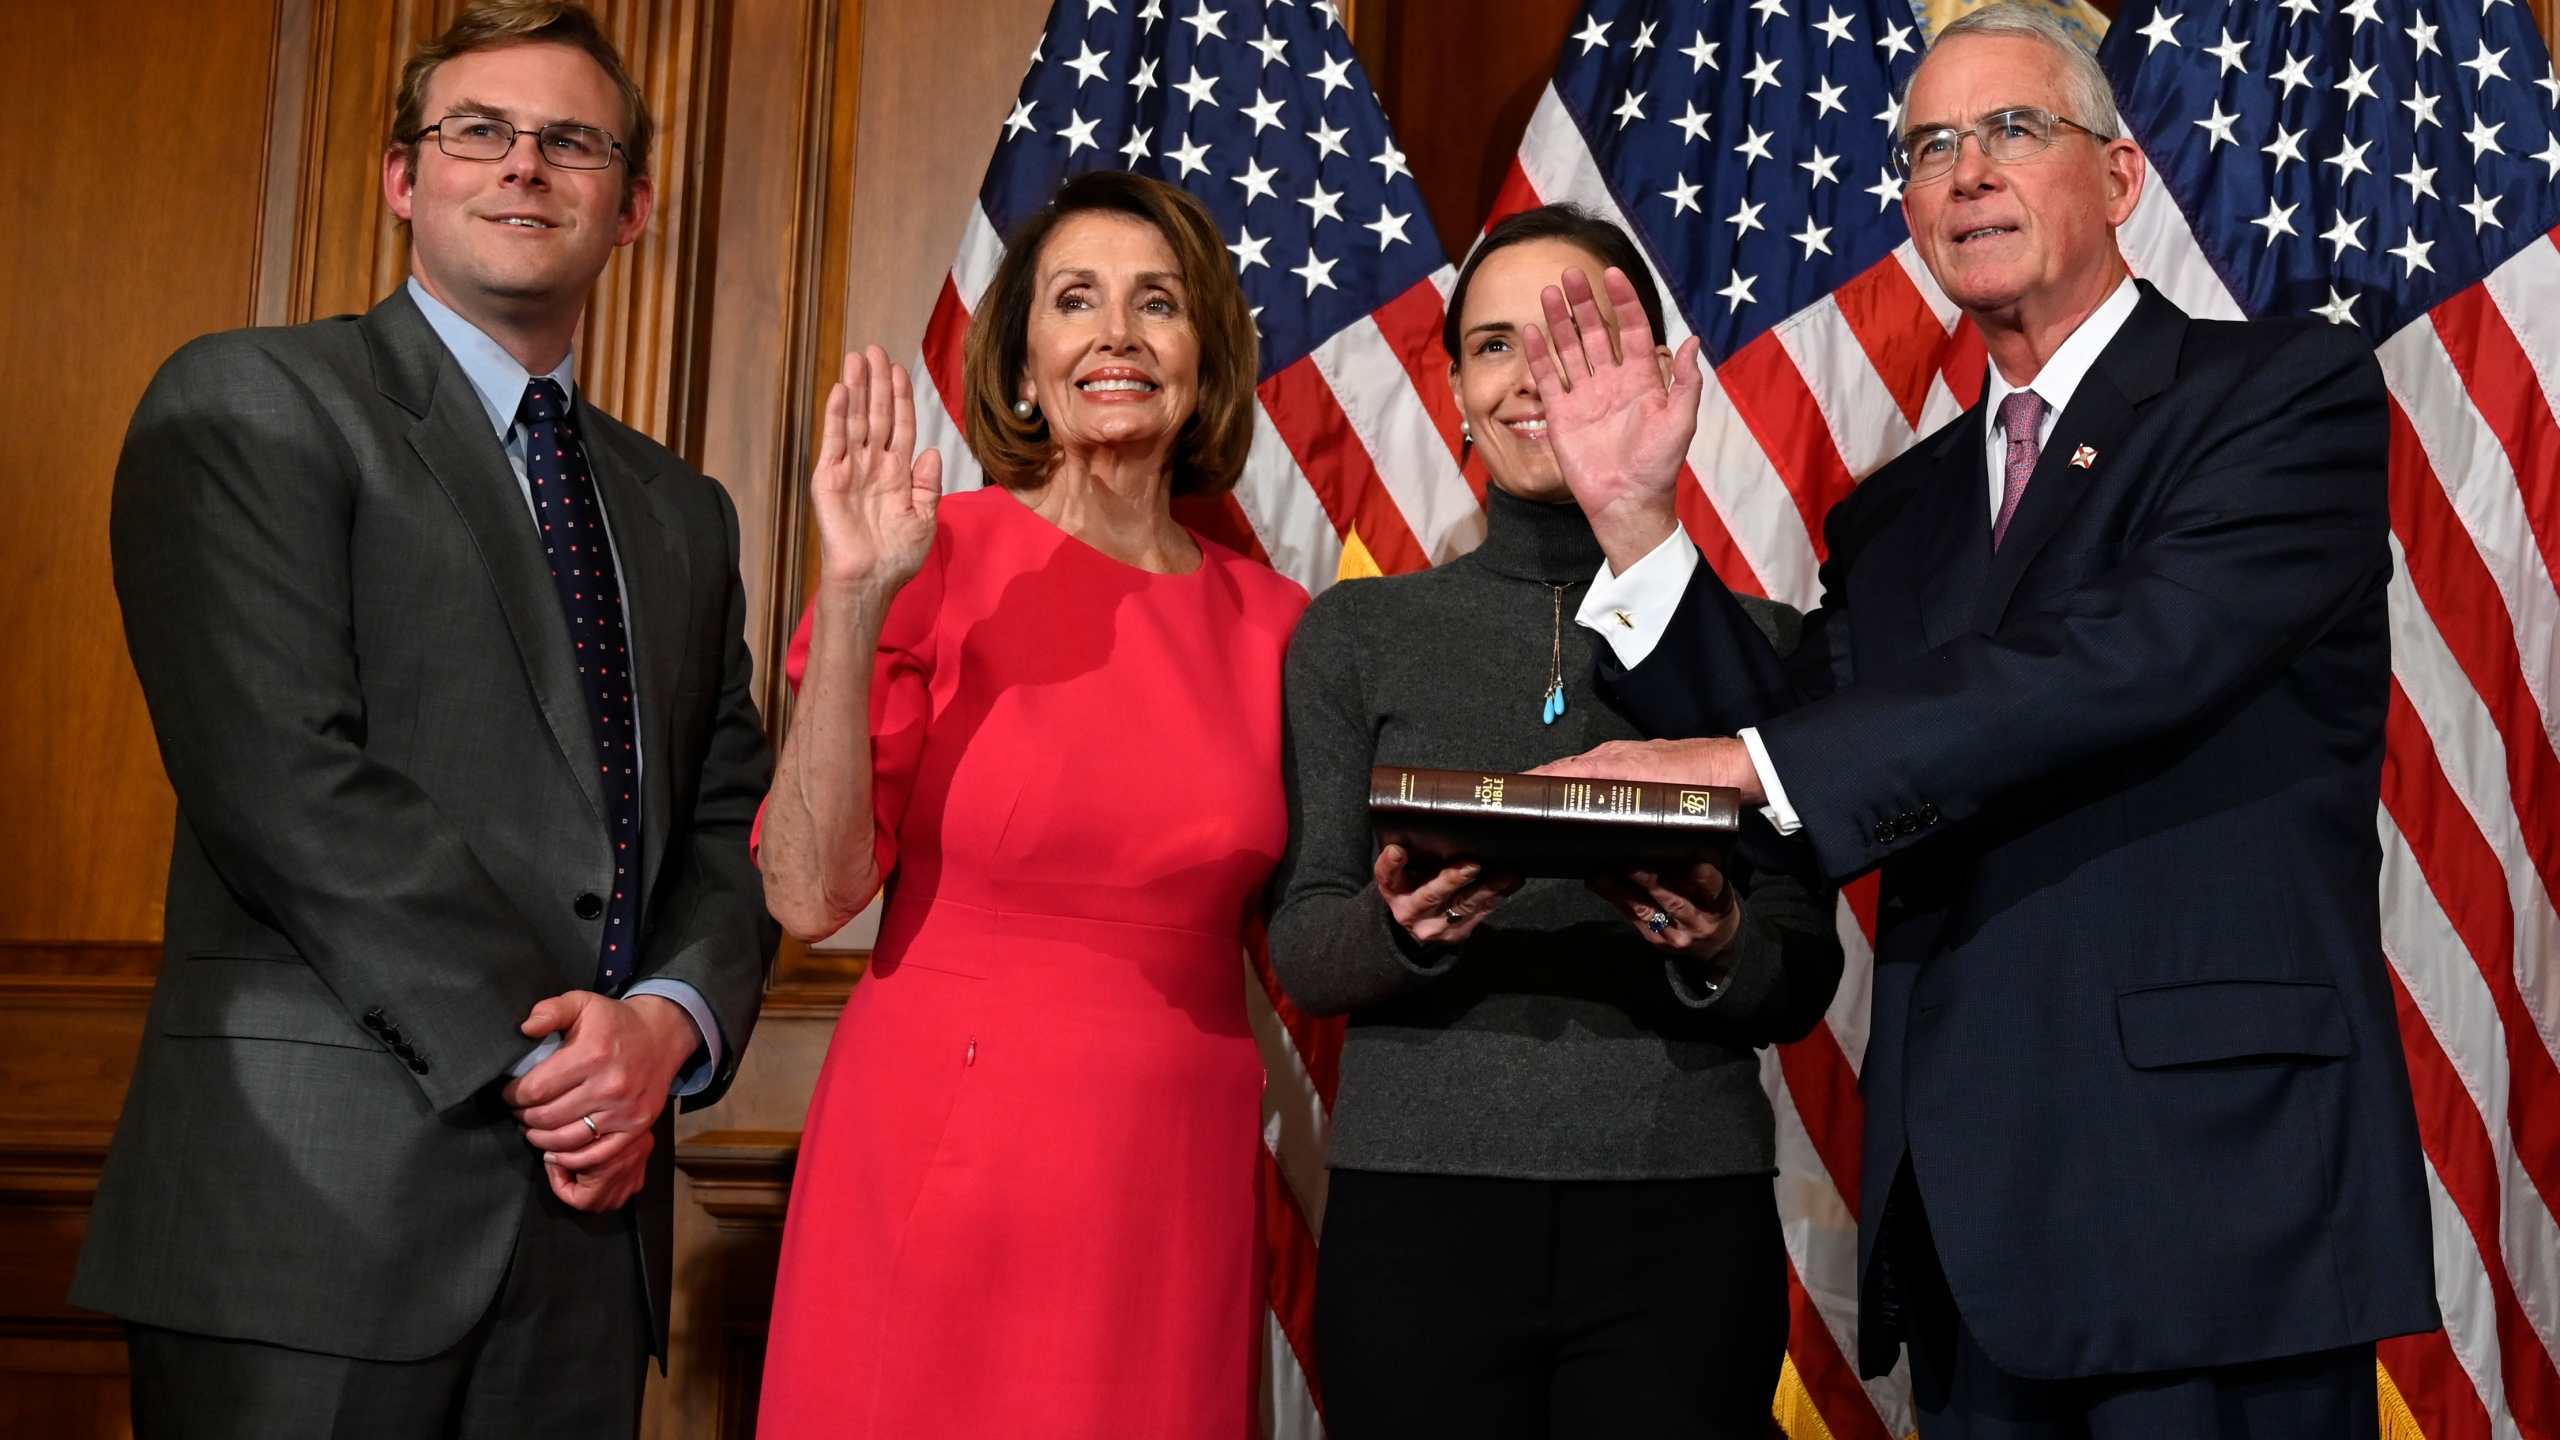 Nancy Pelosi, Francis Rooney